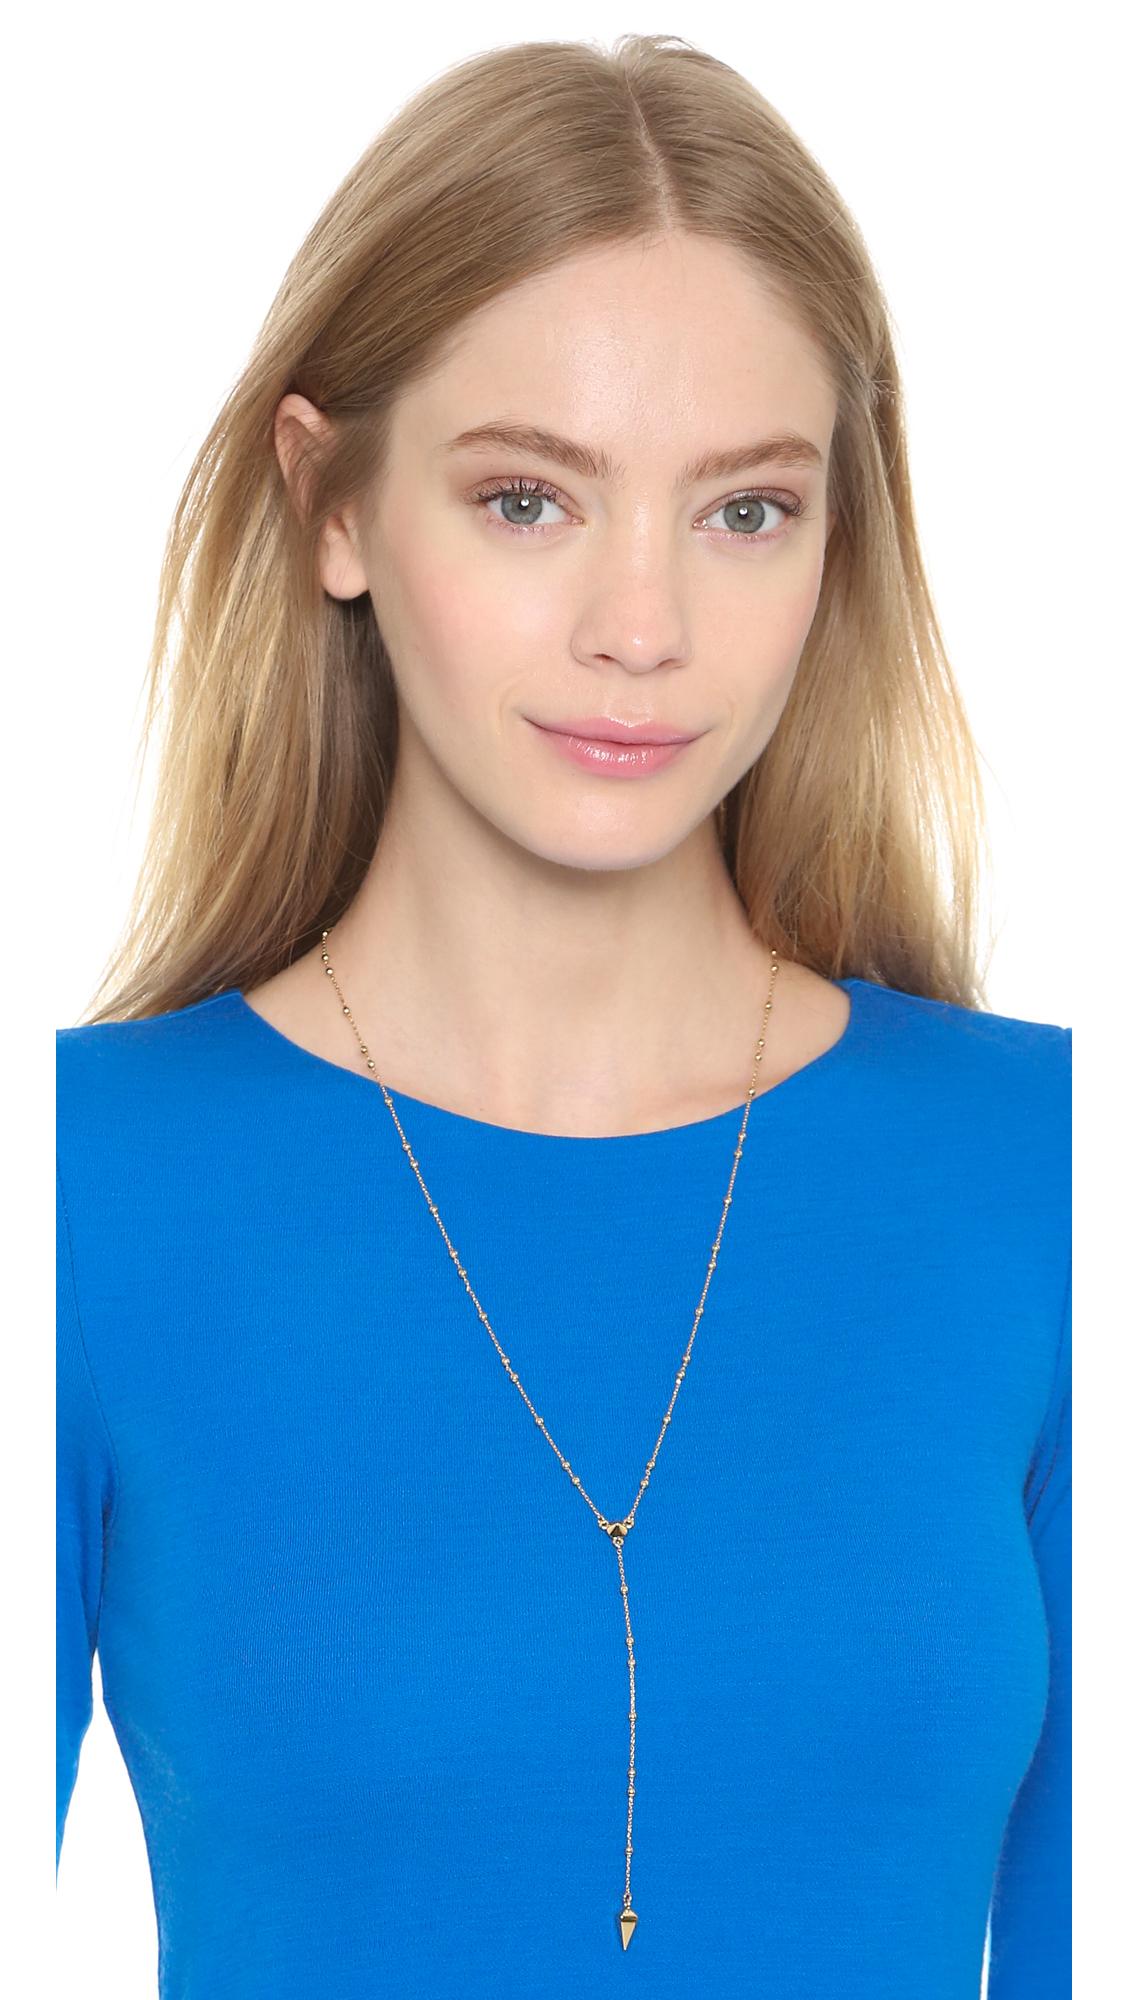 Lyst - Rebecca minkoff Beaded Y Necklace in Metallic